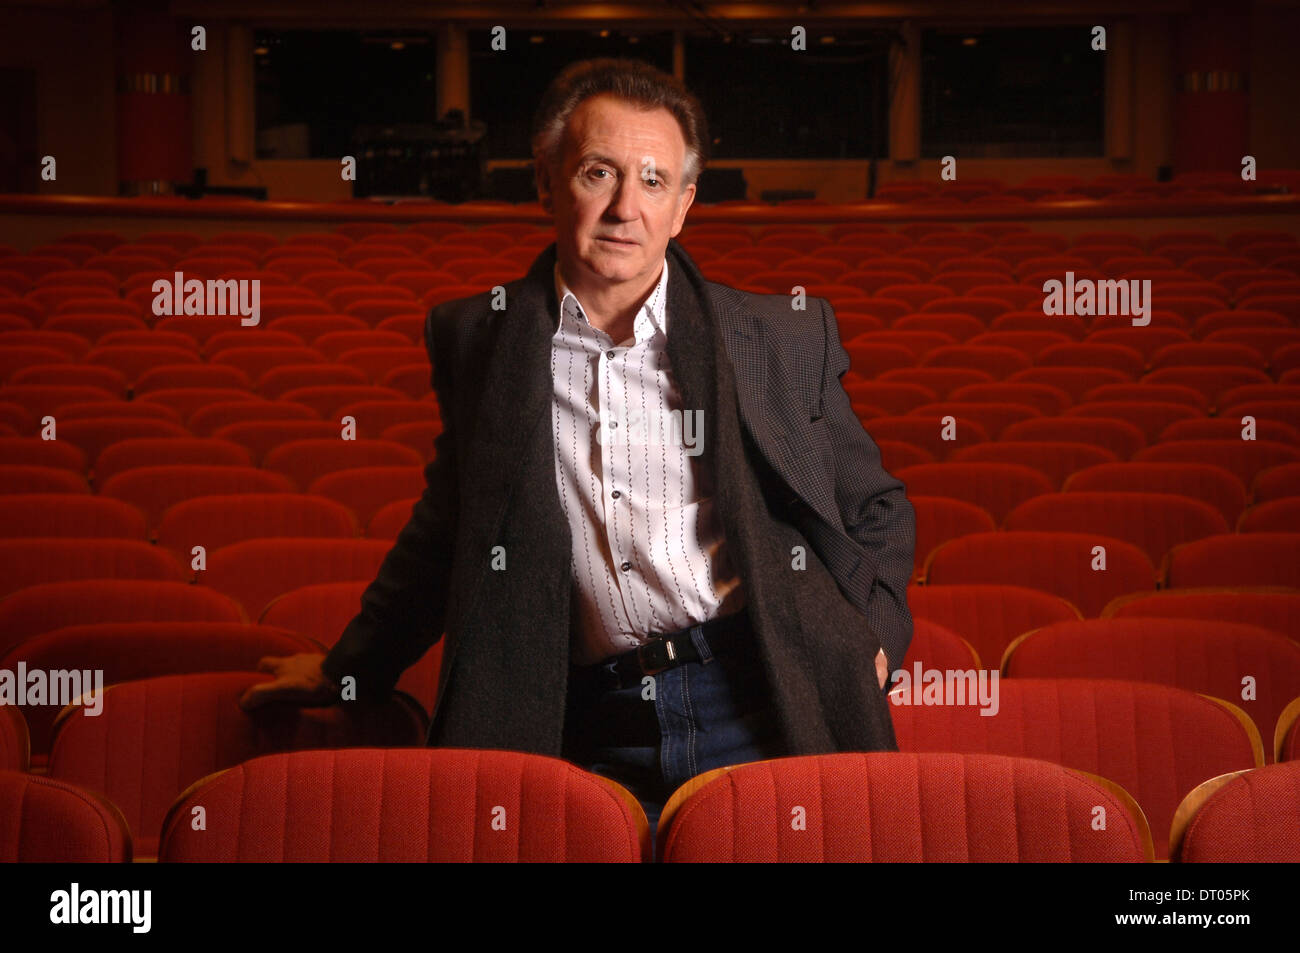 Tony Christie photographed at The Birmingham Symphony Hall,UK. - Stock Image